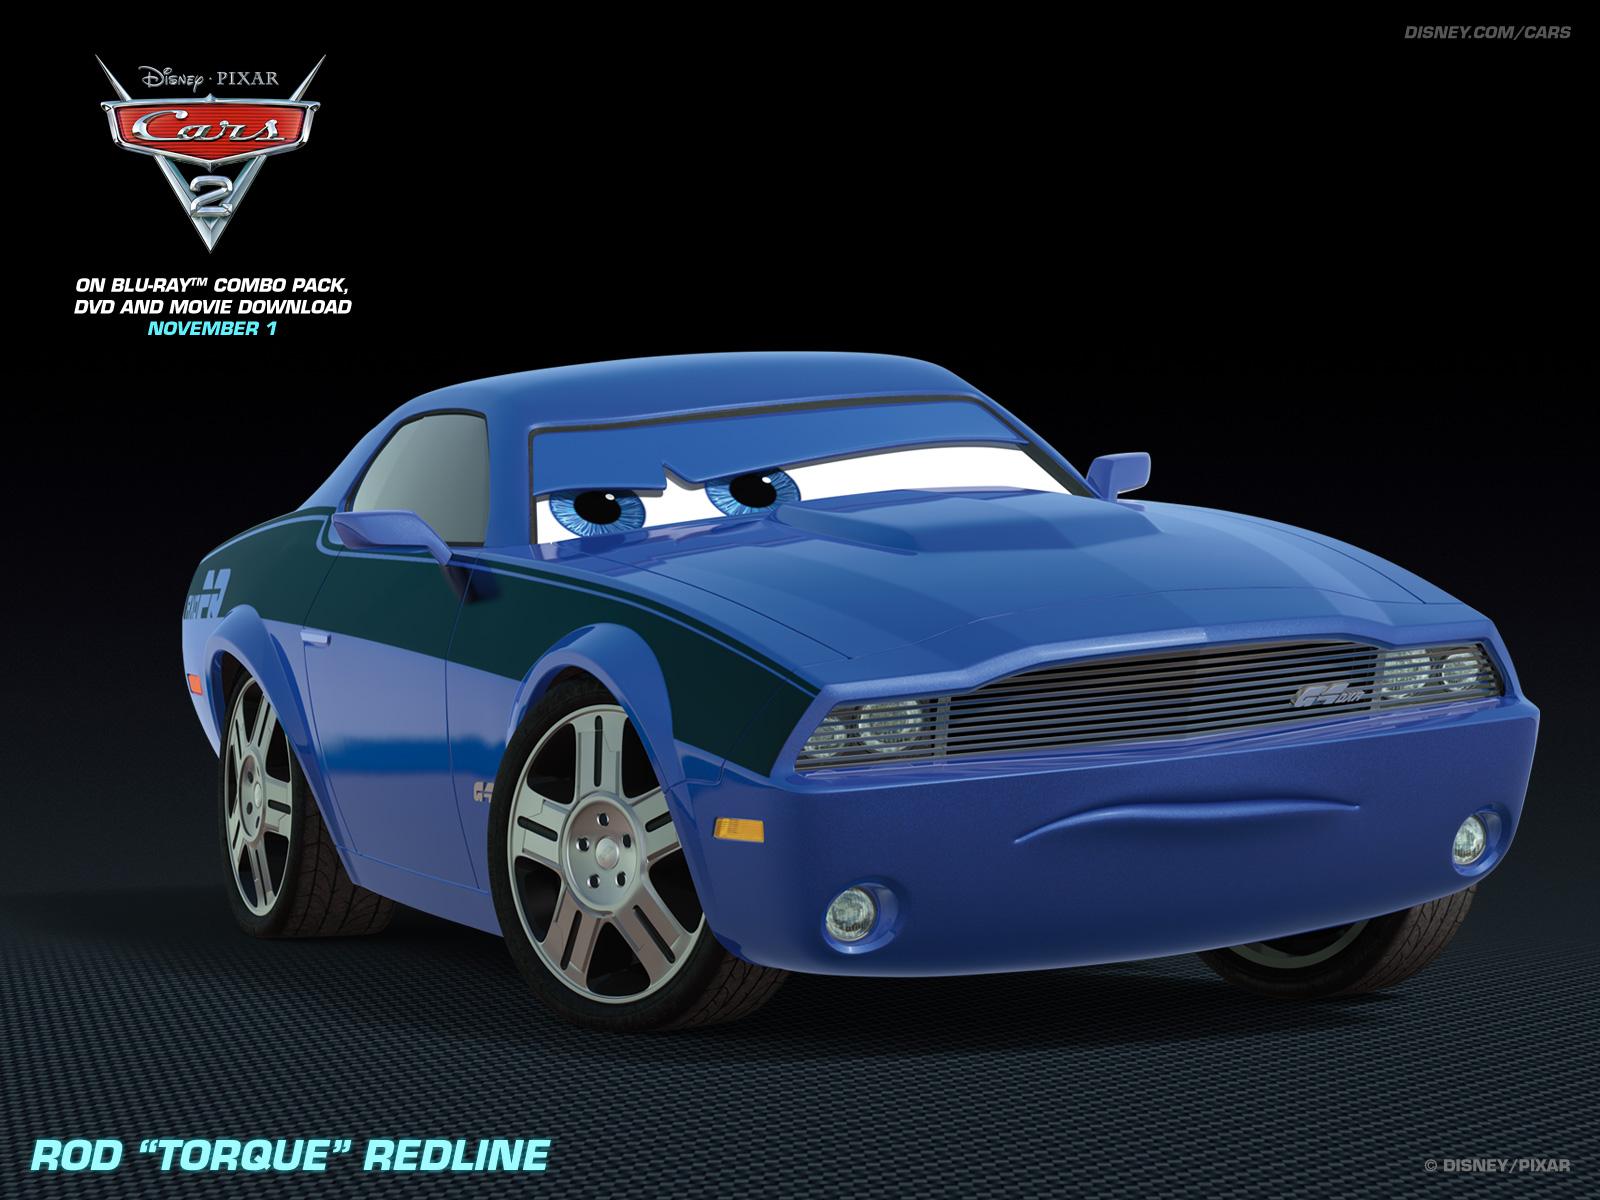 Rod Torque Redline   Disney Pixar Cars 2 Wallpaper 28399996 1600x1200